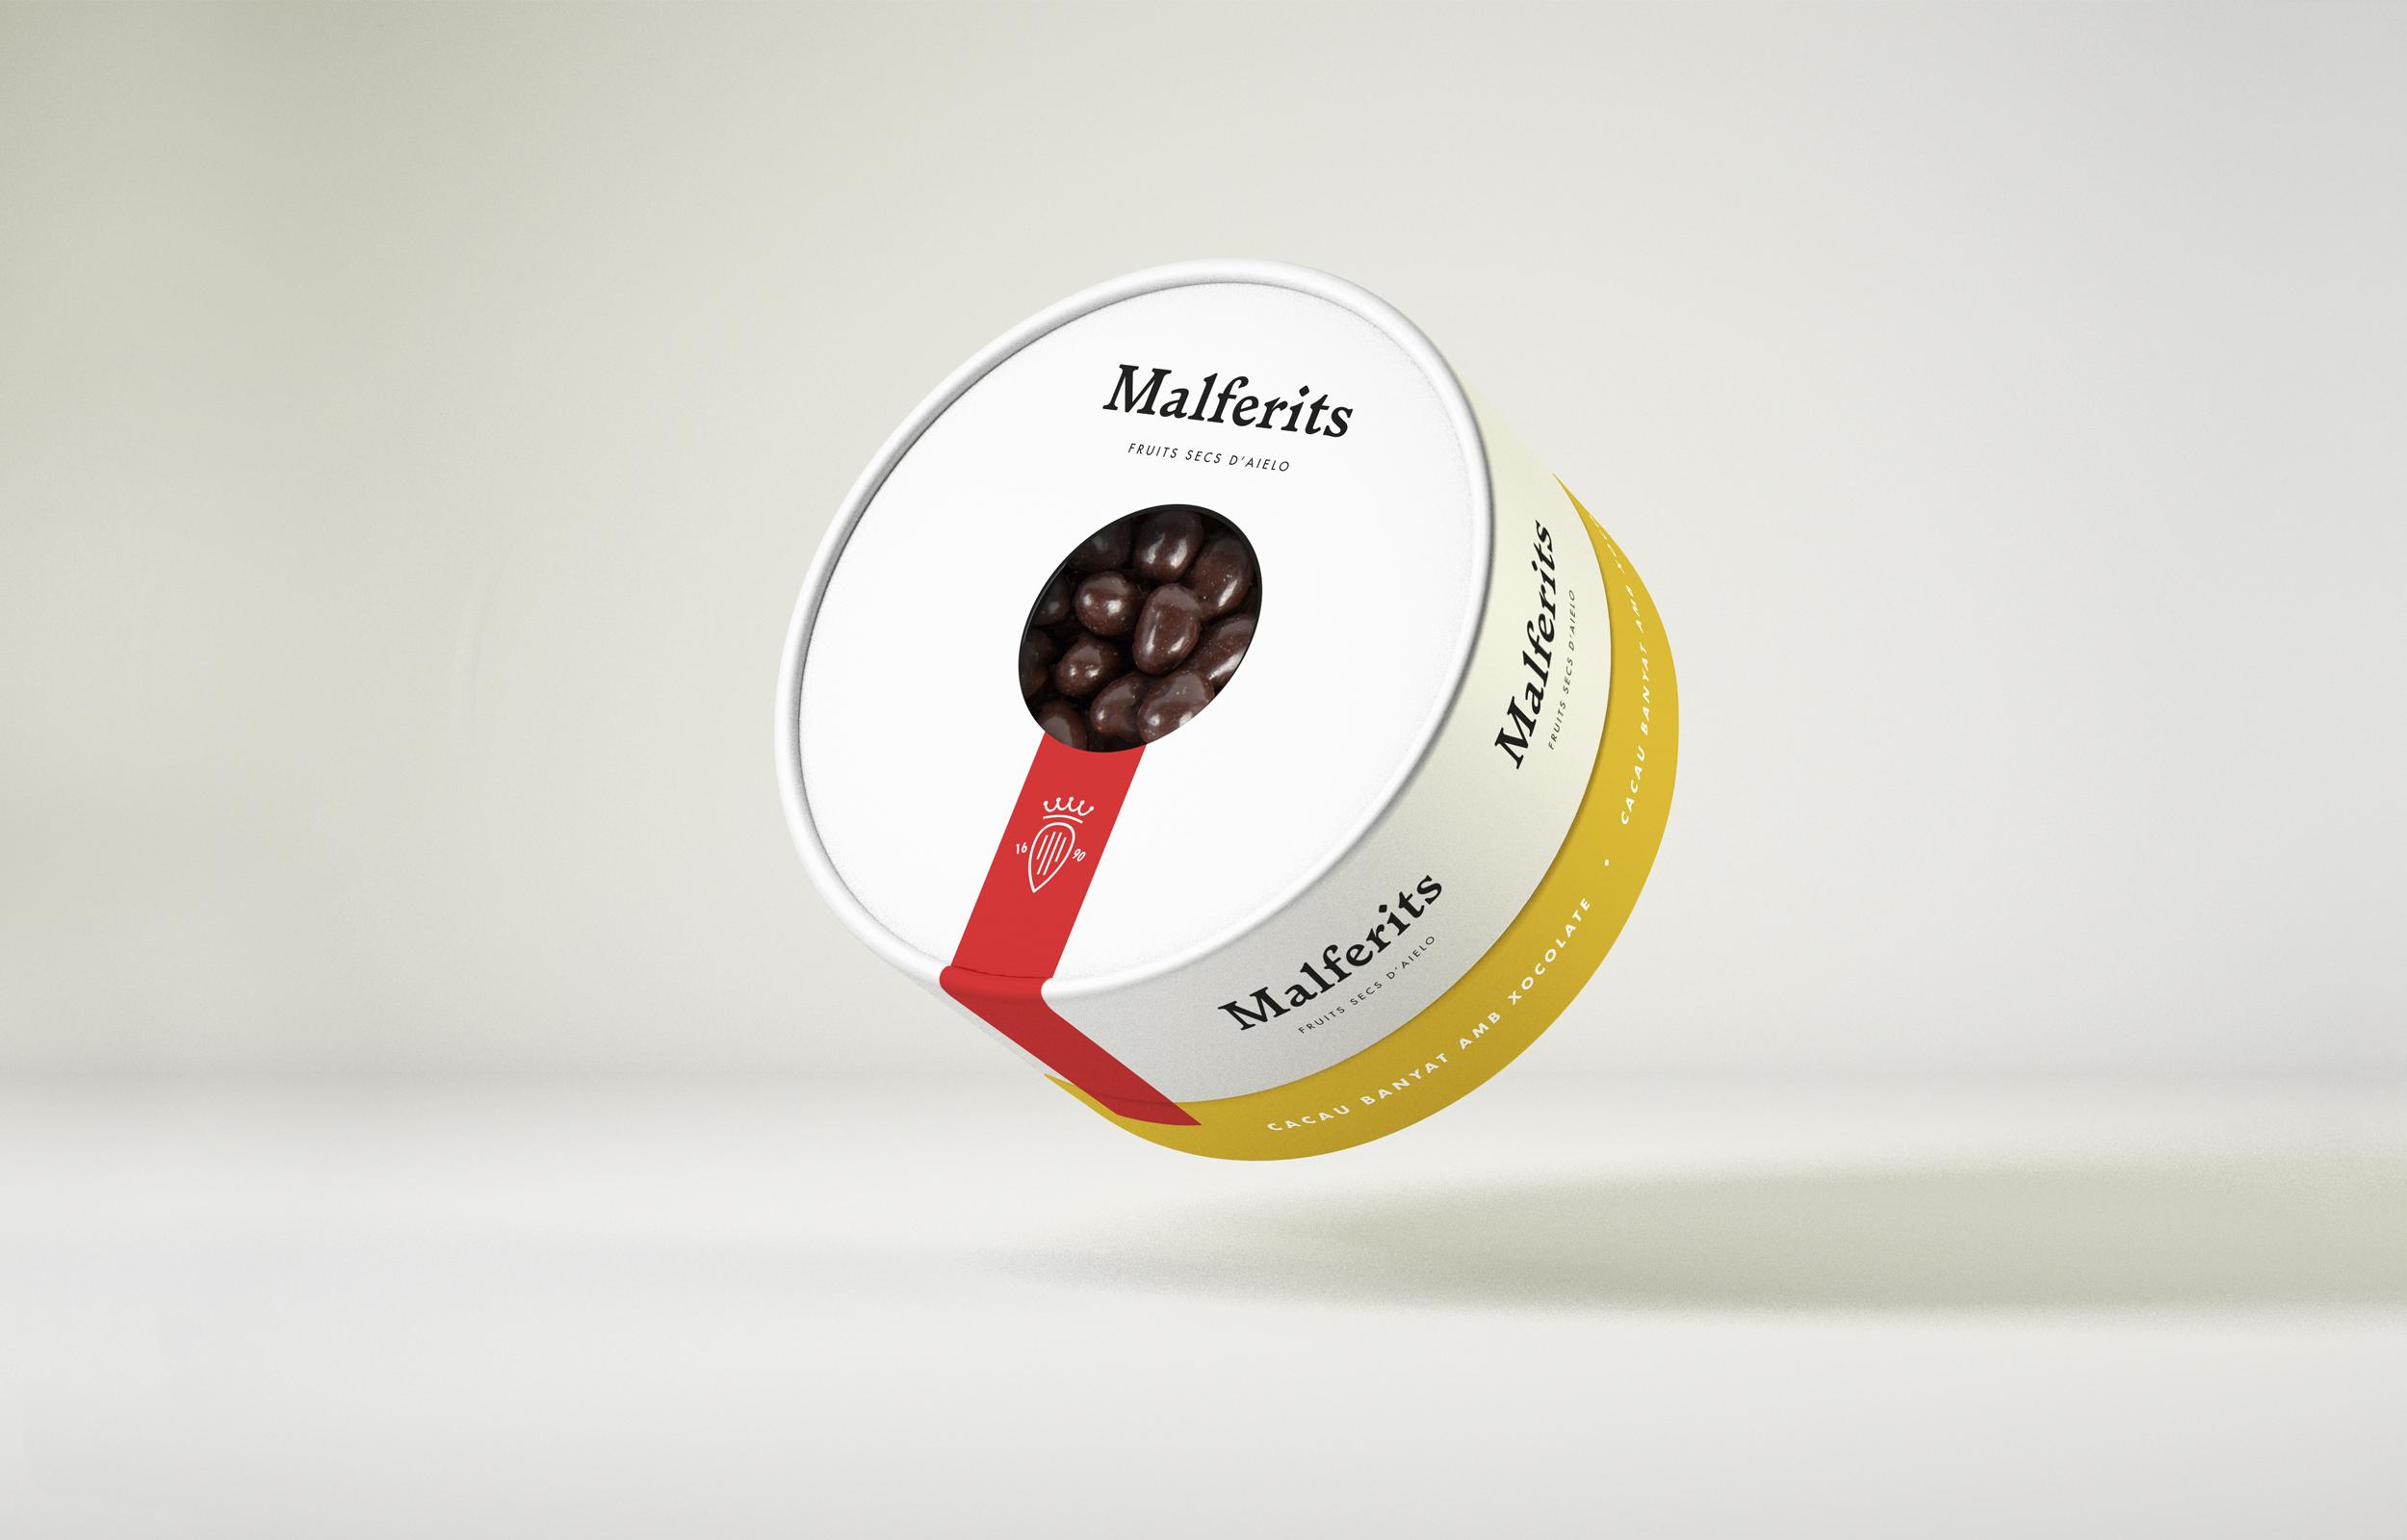 Malferits by Laura Garcia Mut - Creative Work